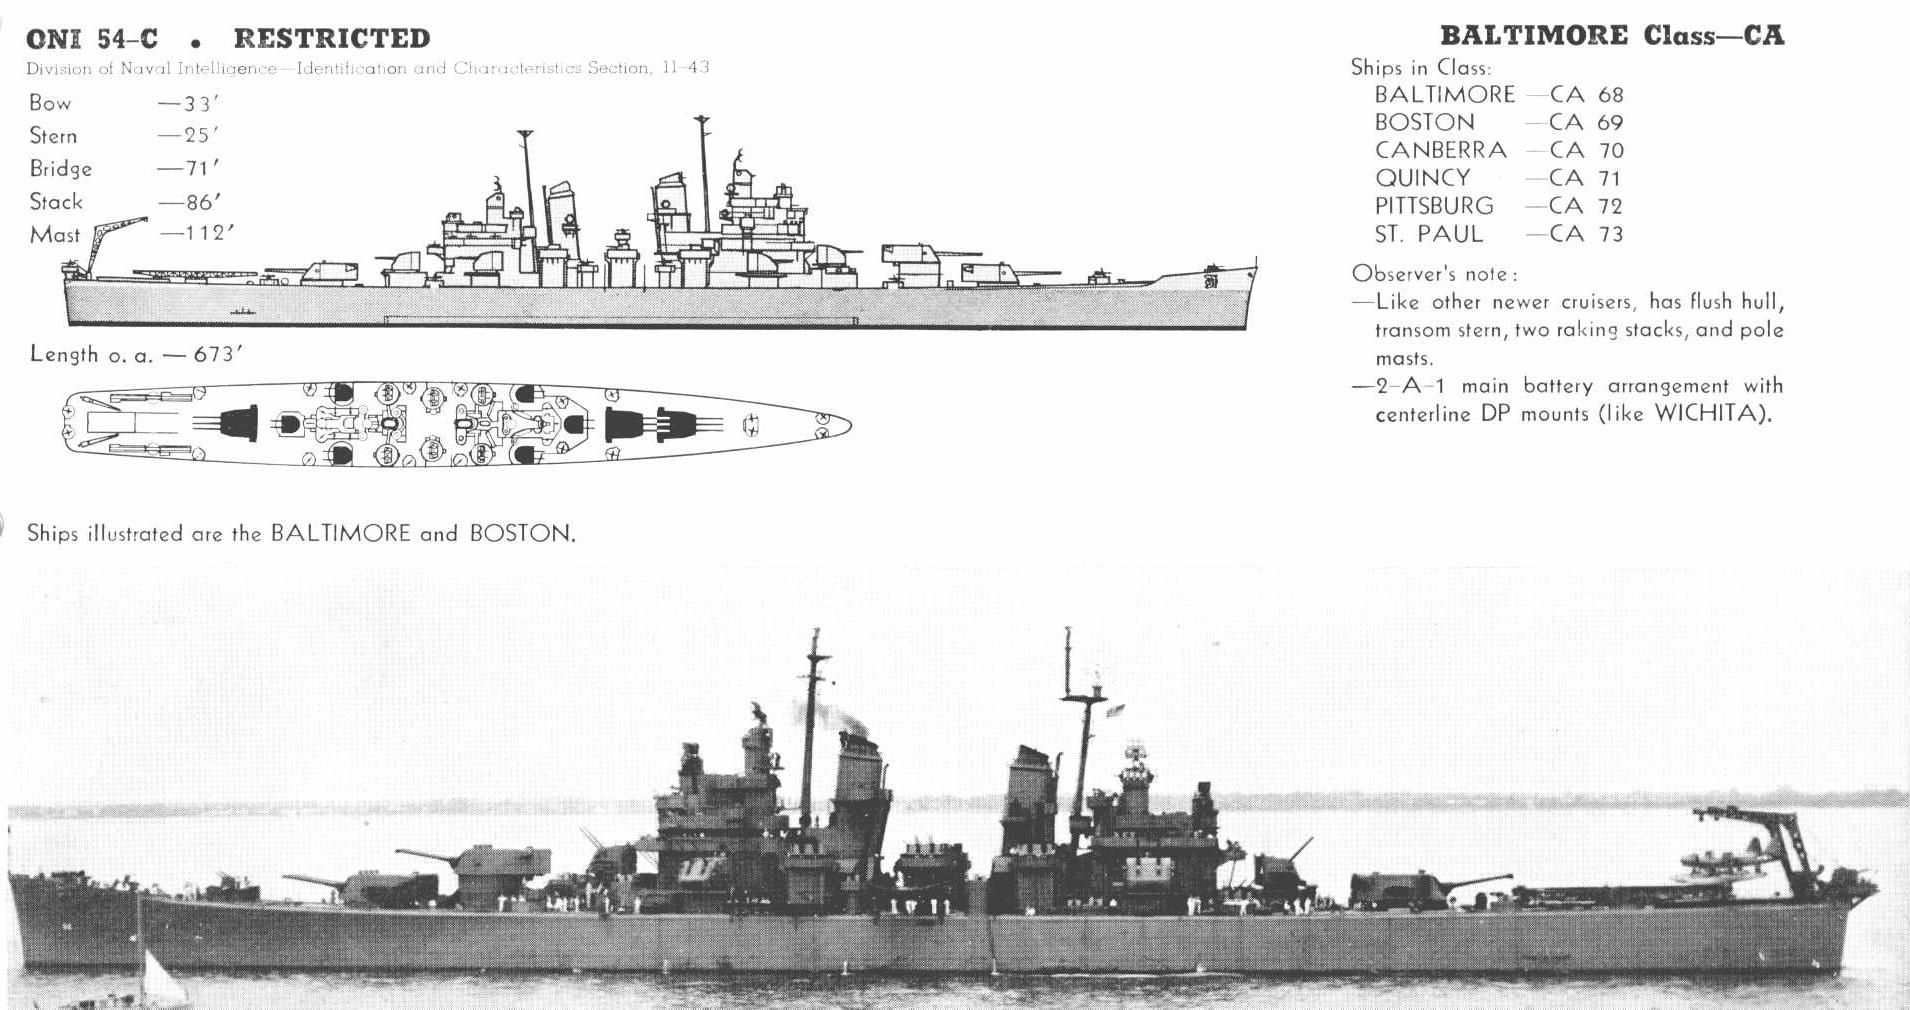 uss baltimore class heavy cruiser warships diagram 182. Black Bedroom Furniture Sets. Home Design Ideas